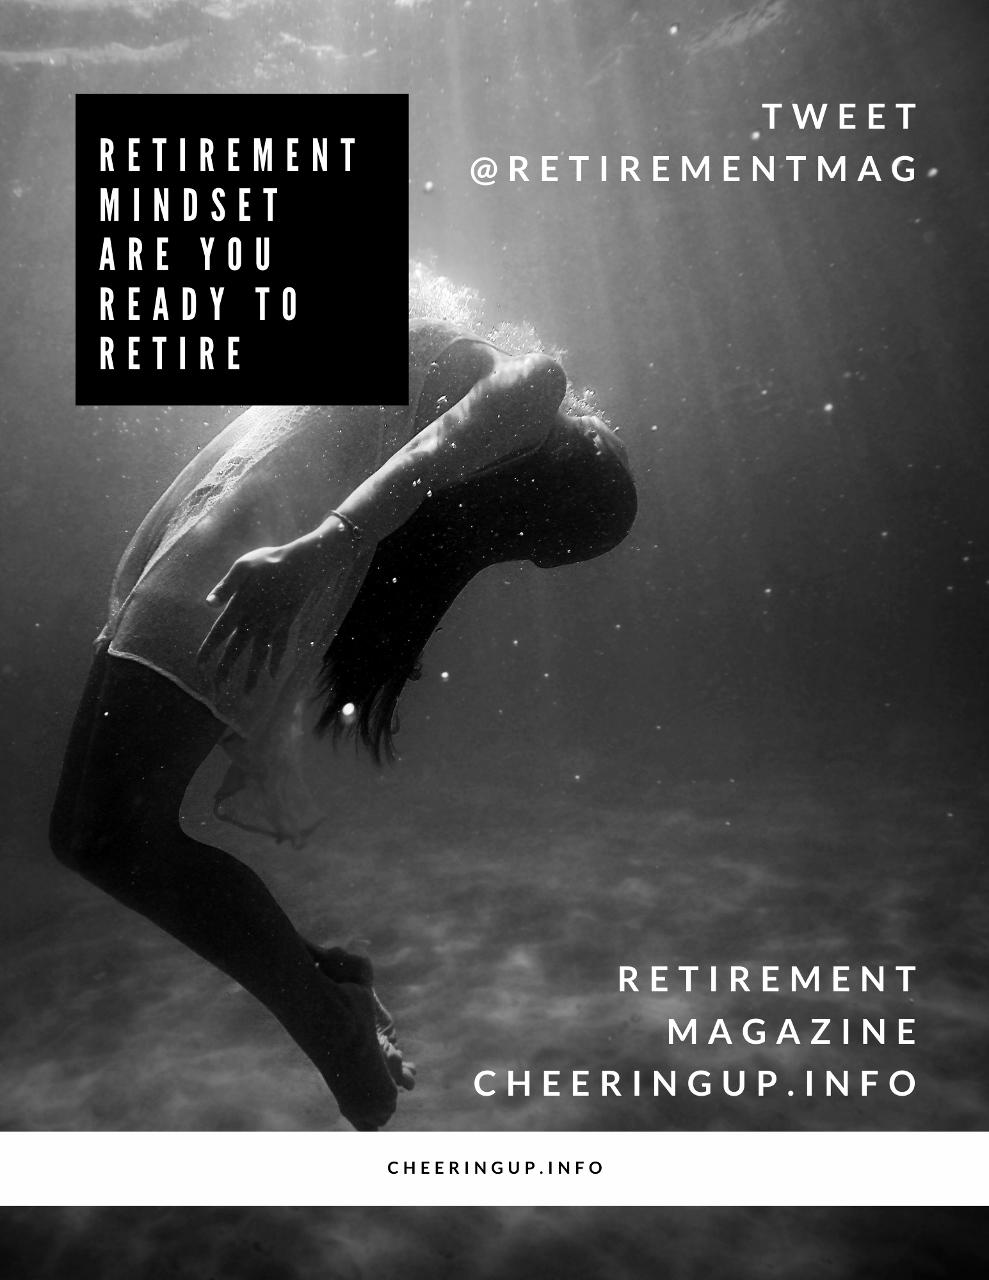 Retirement Mindset